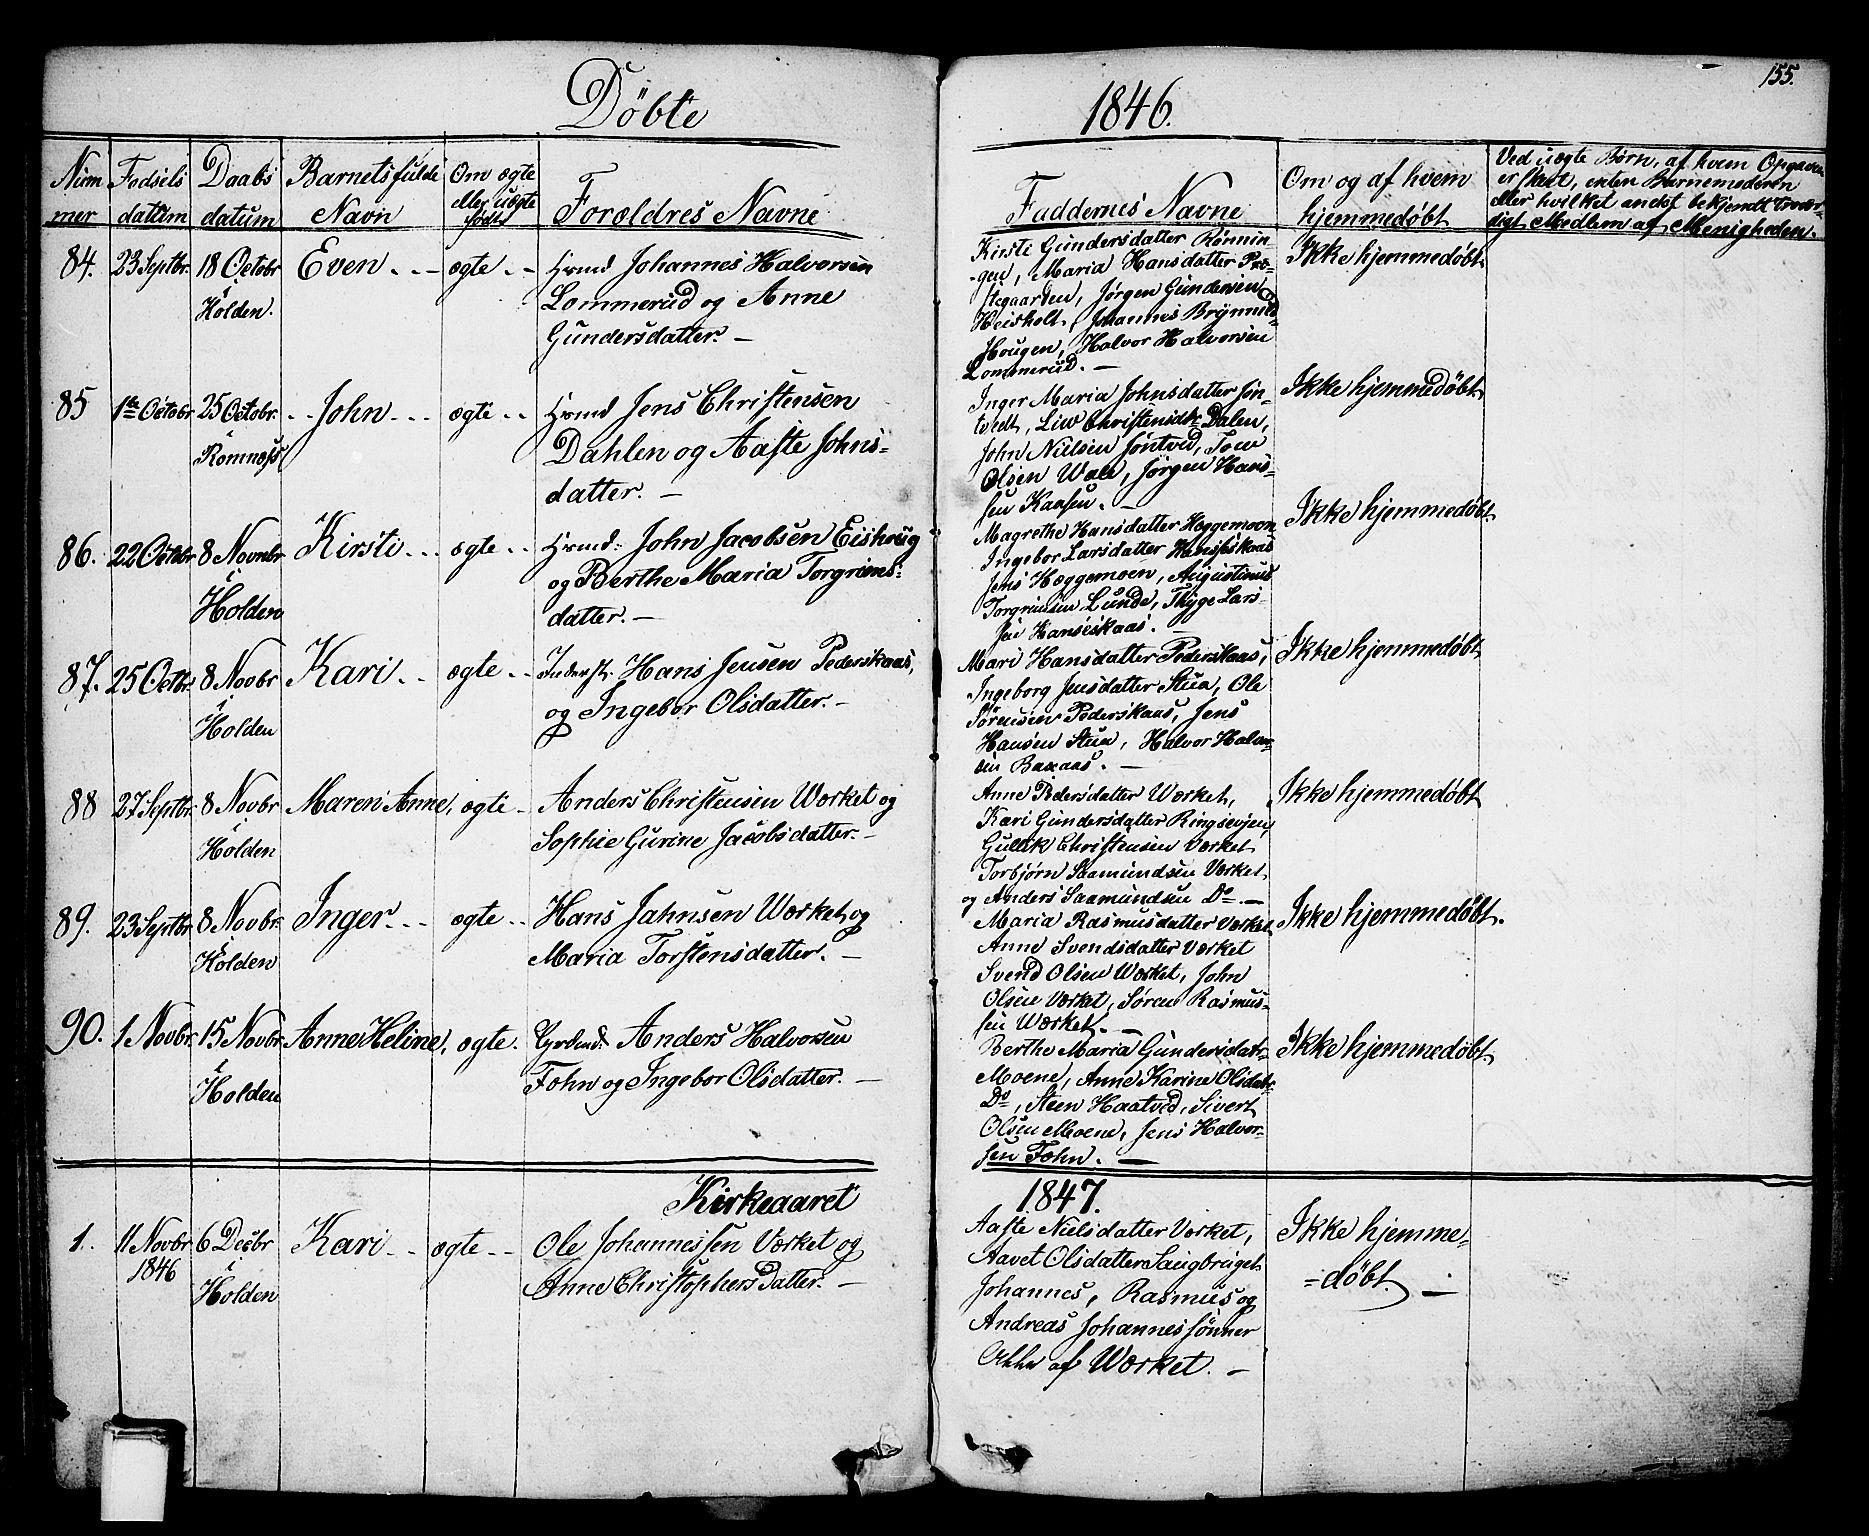 SAKO, Holla kirkebøker, F/Fa/L0004: Ministerialbok nr. 4, 1830-1848, s. 155